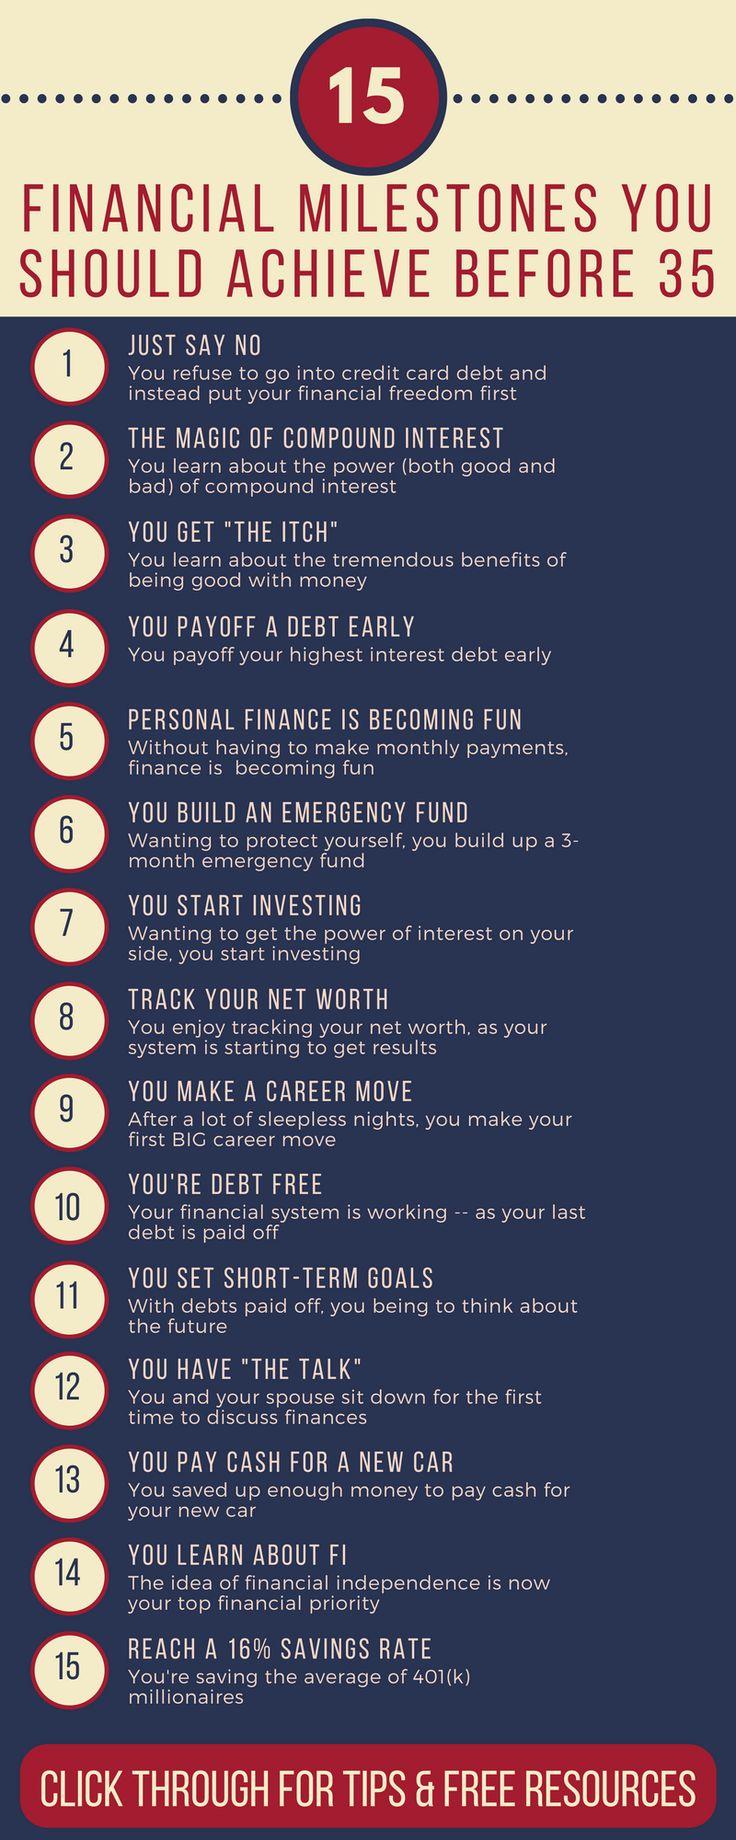 18 Financial Goals You Should Accomplish Before Turning 35Money Badass